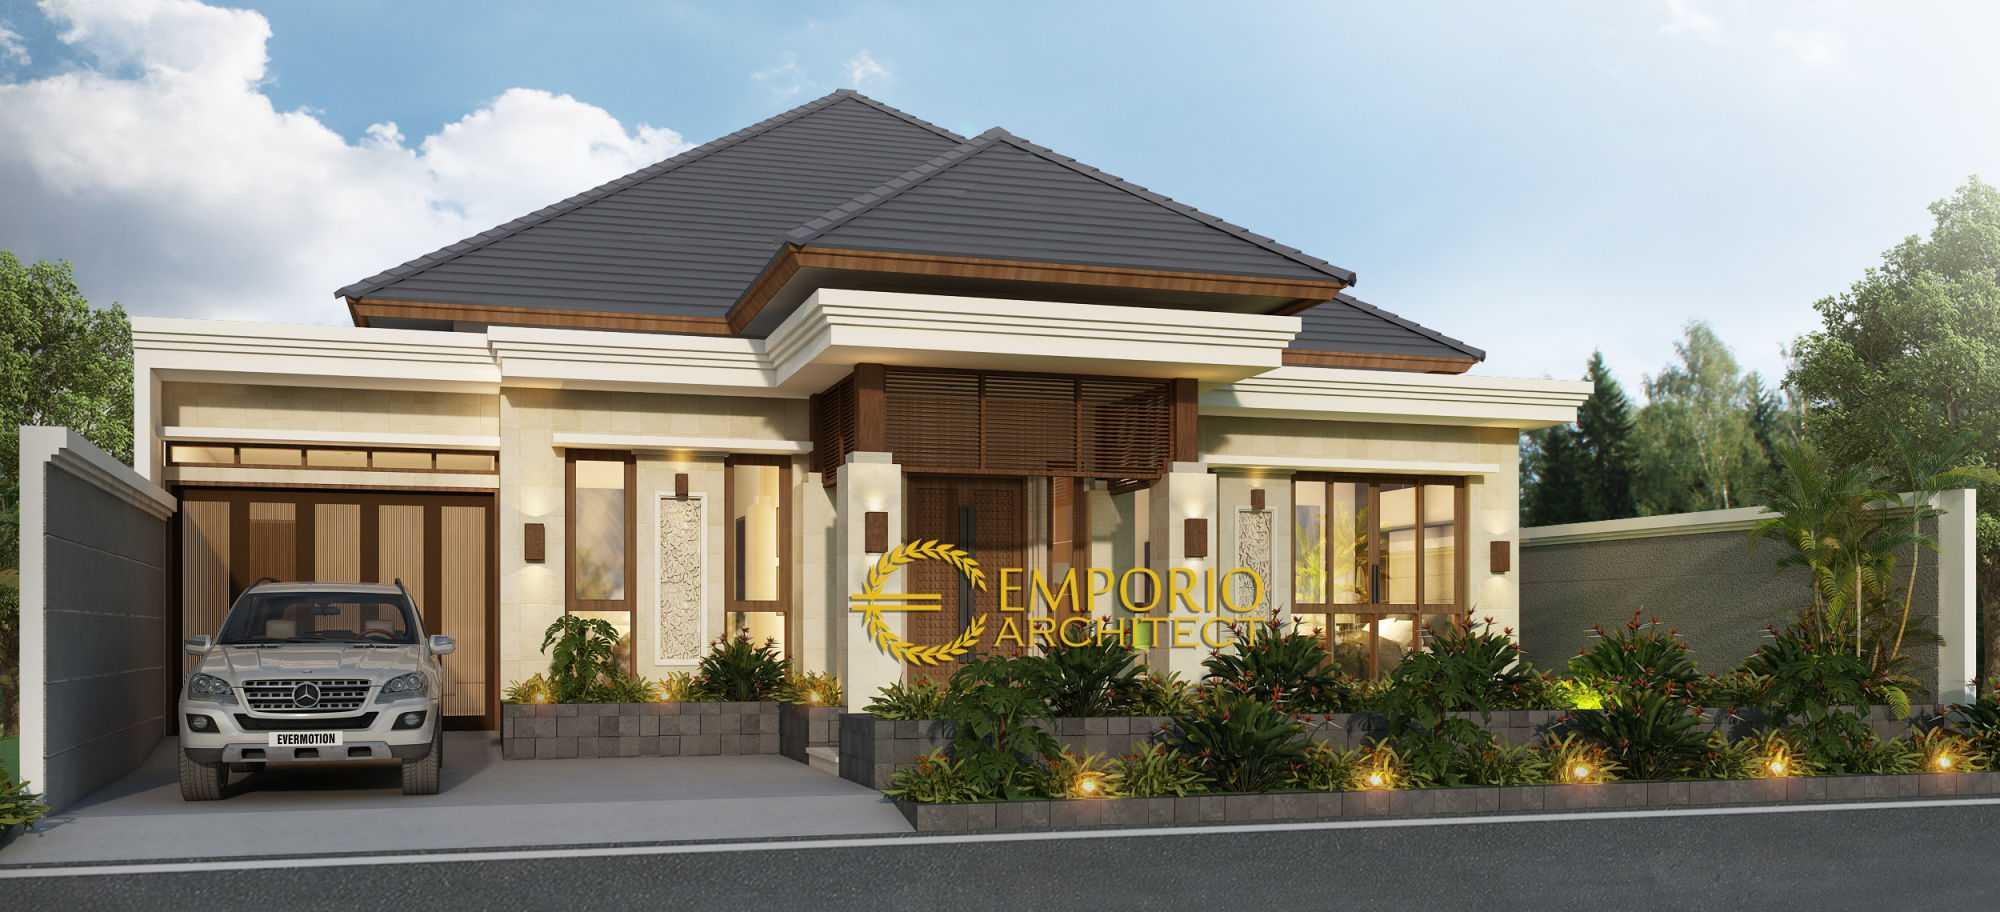 Emporio Architect di Pekanbaru